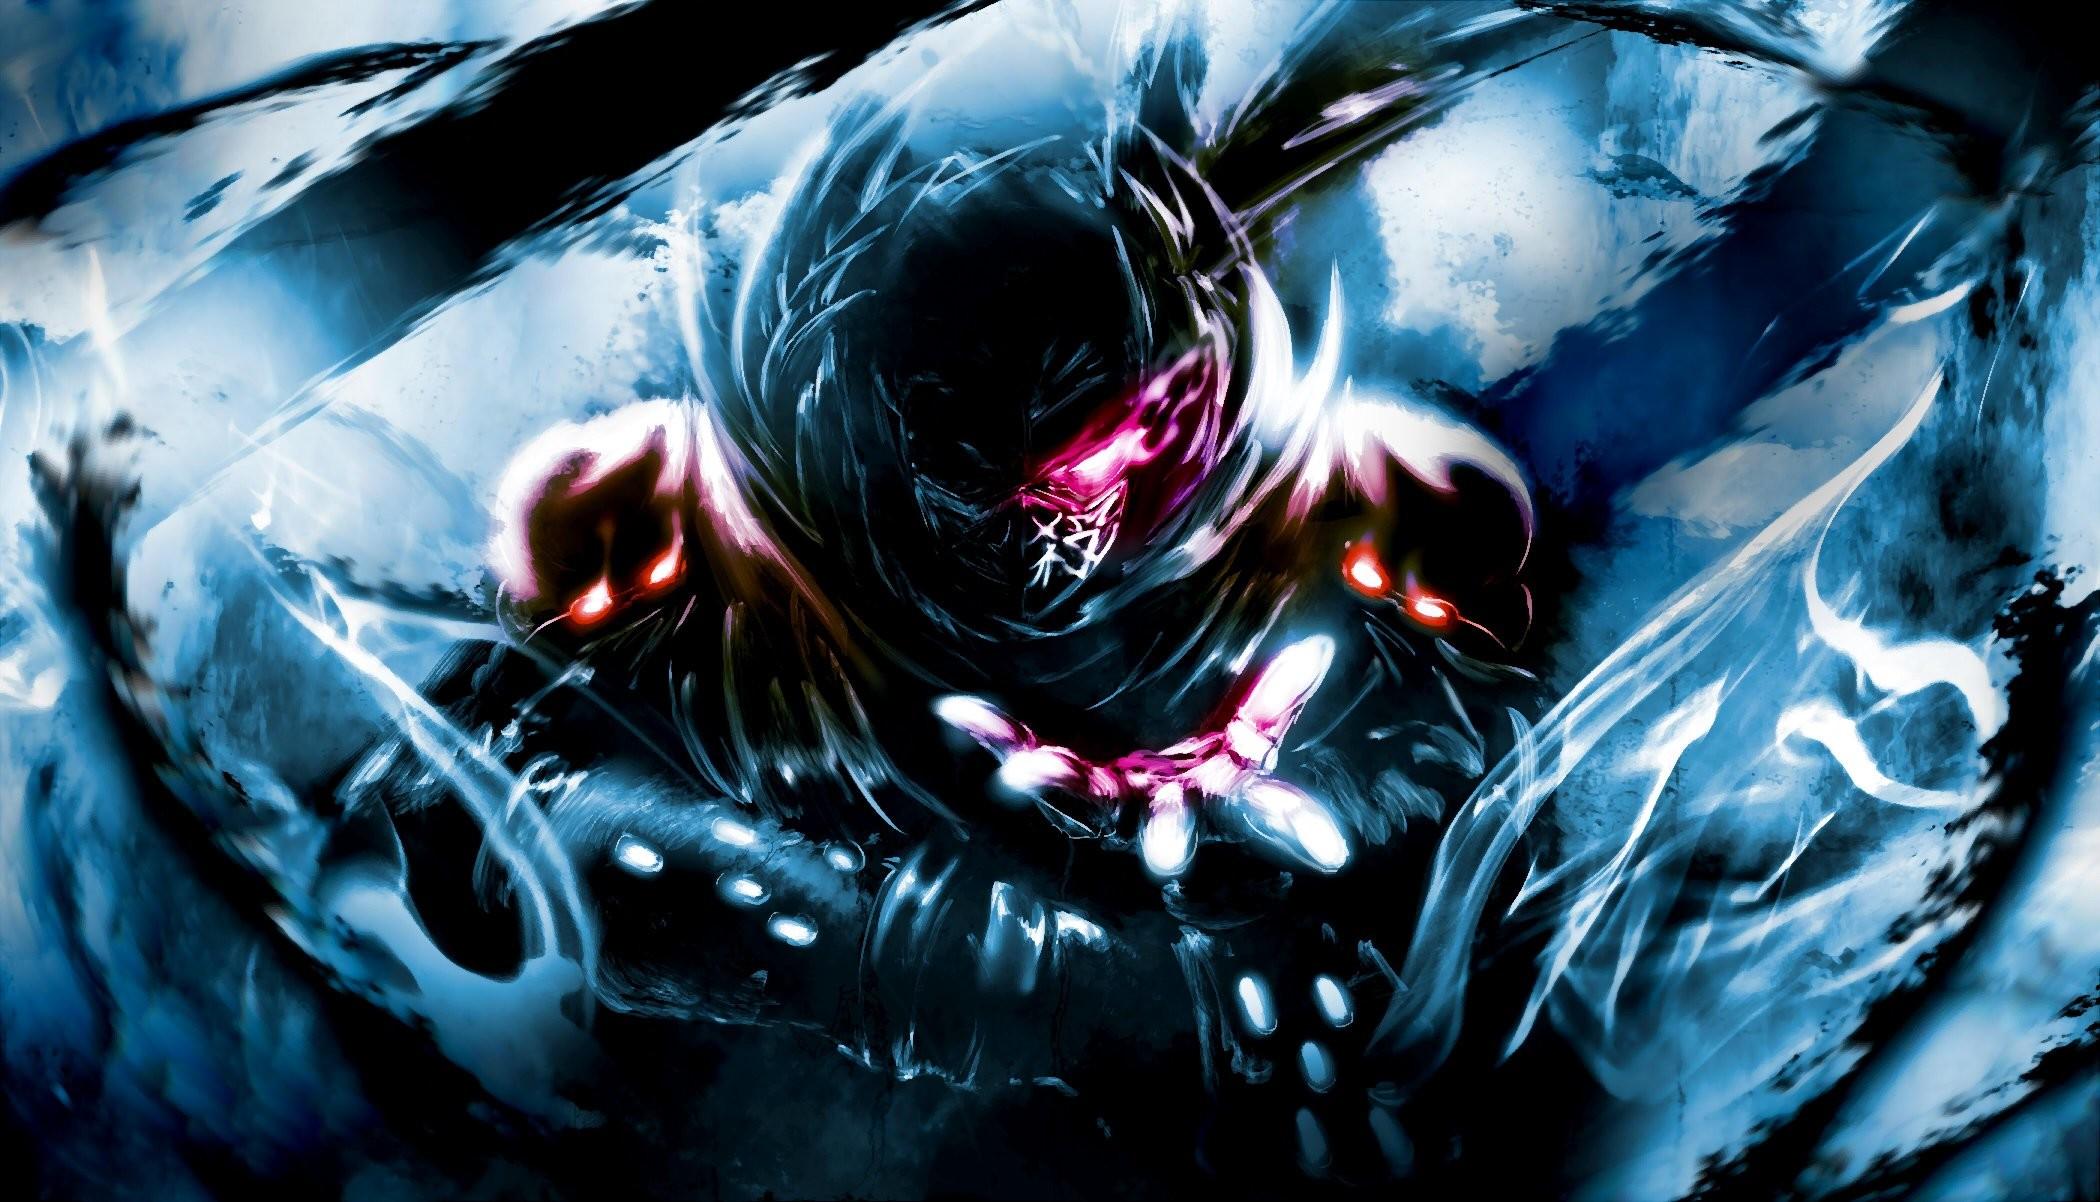 Women Warrior Artwork Sword Rain Cyberpunk Cyberpunk: Anime Warrior Wallpaper (80+ Images